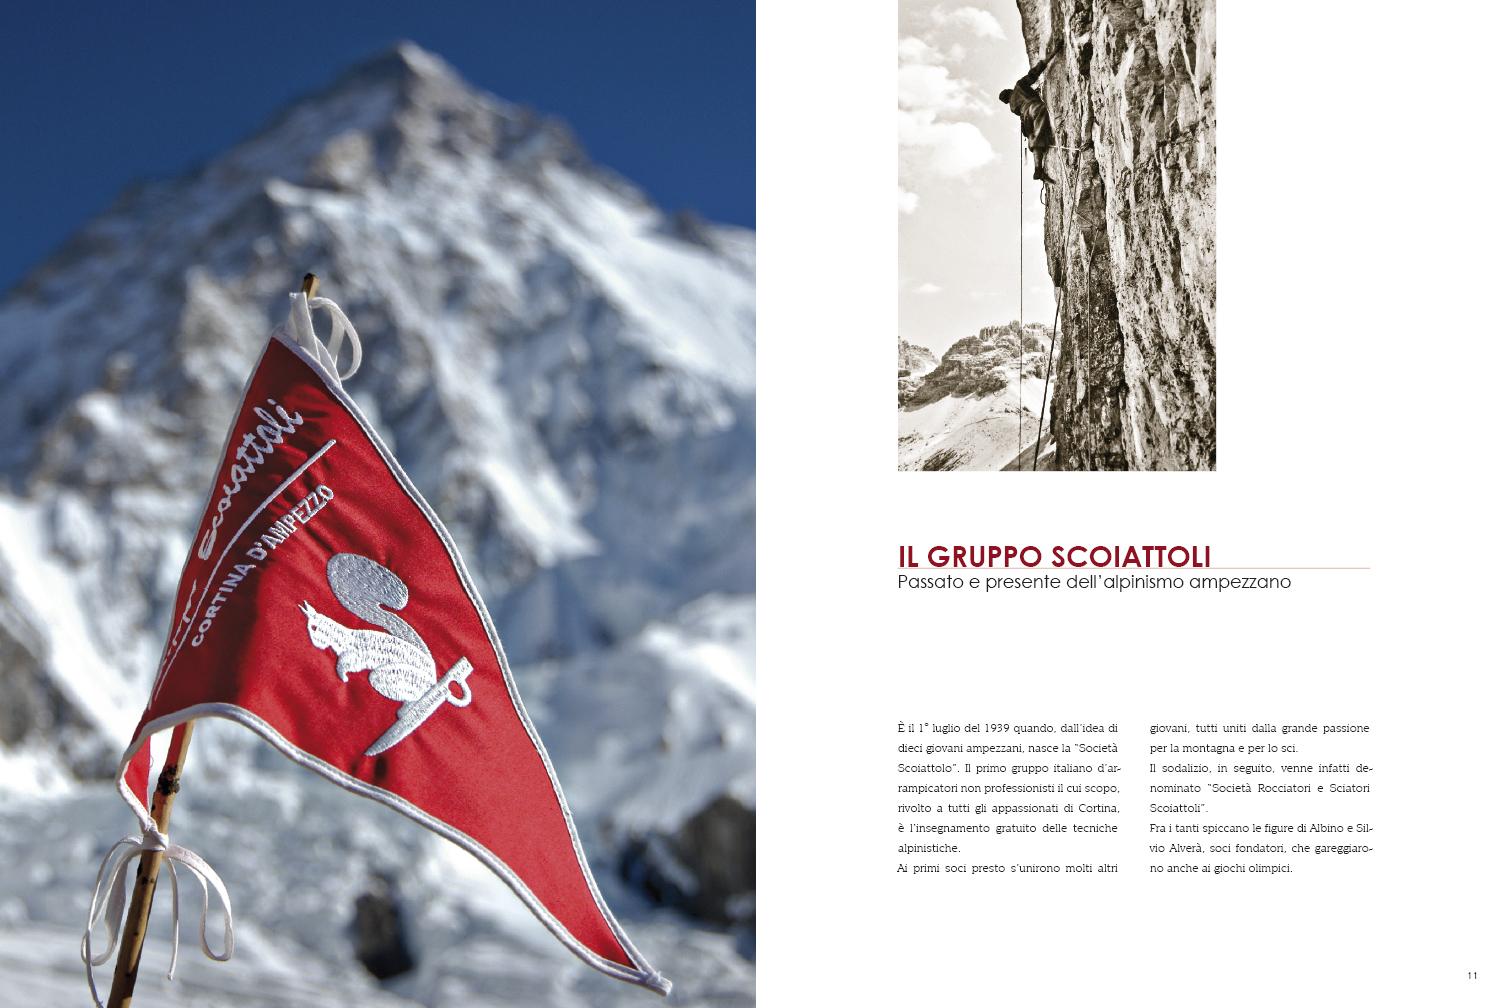 K2 EXPEDITION 1954-2004 Giuseppe Ghedina Fotografo - 007.jpg